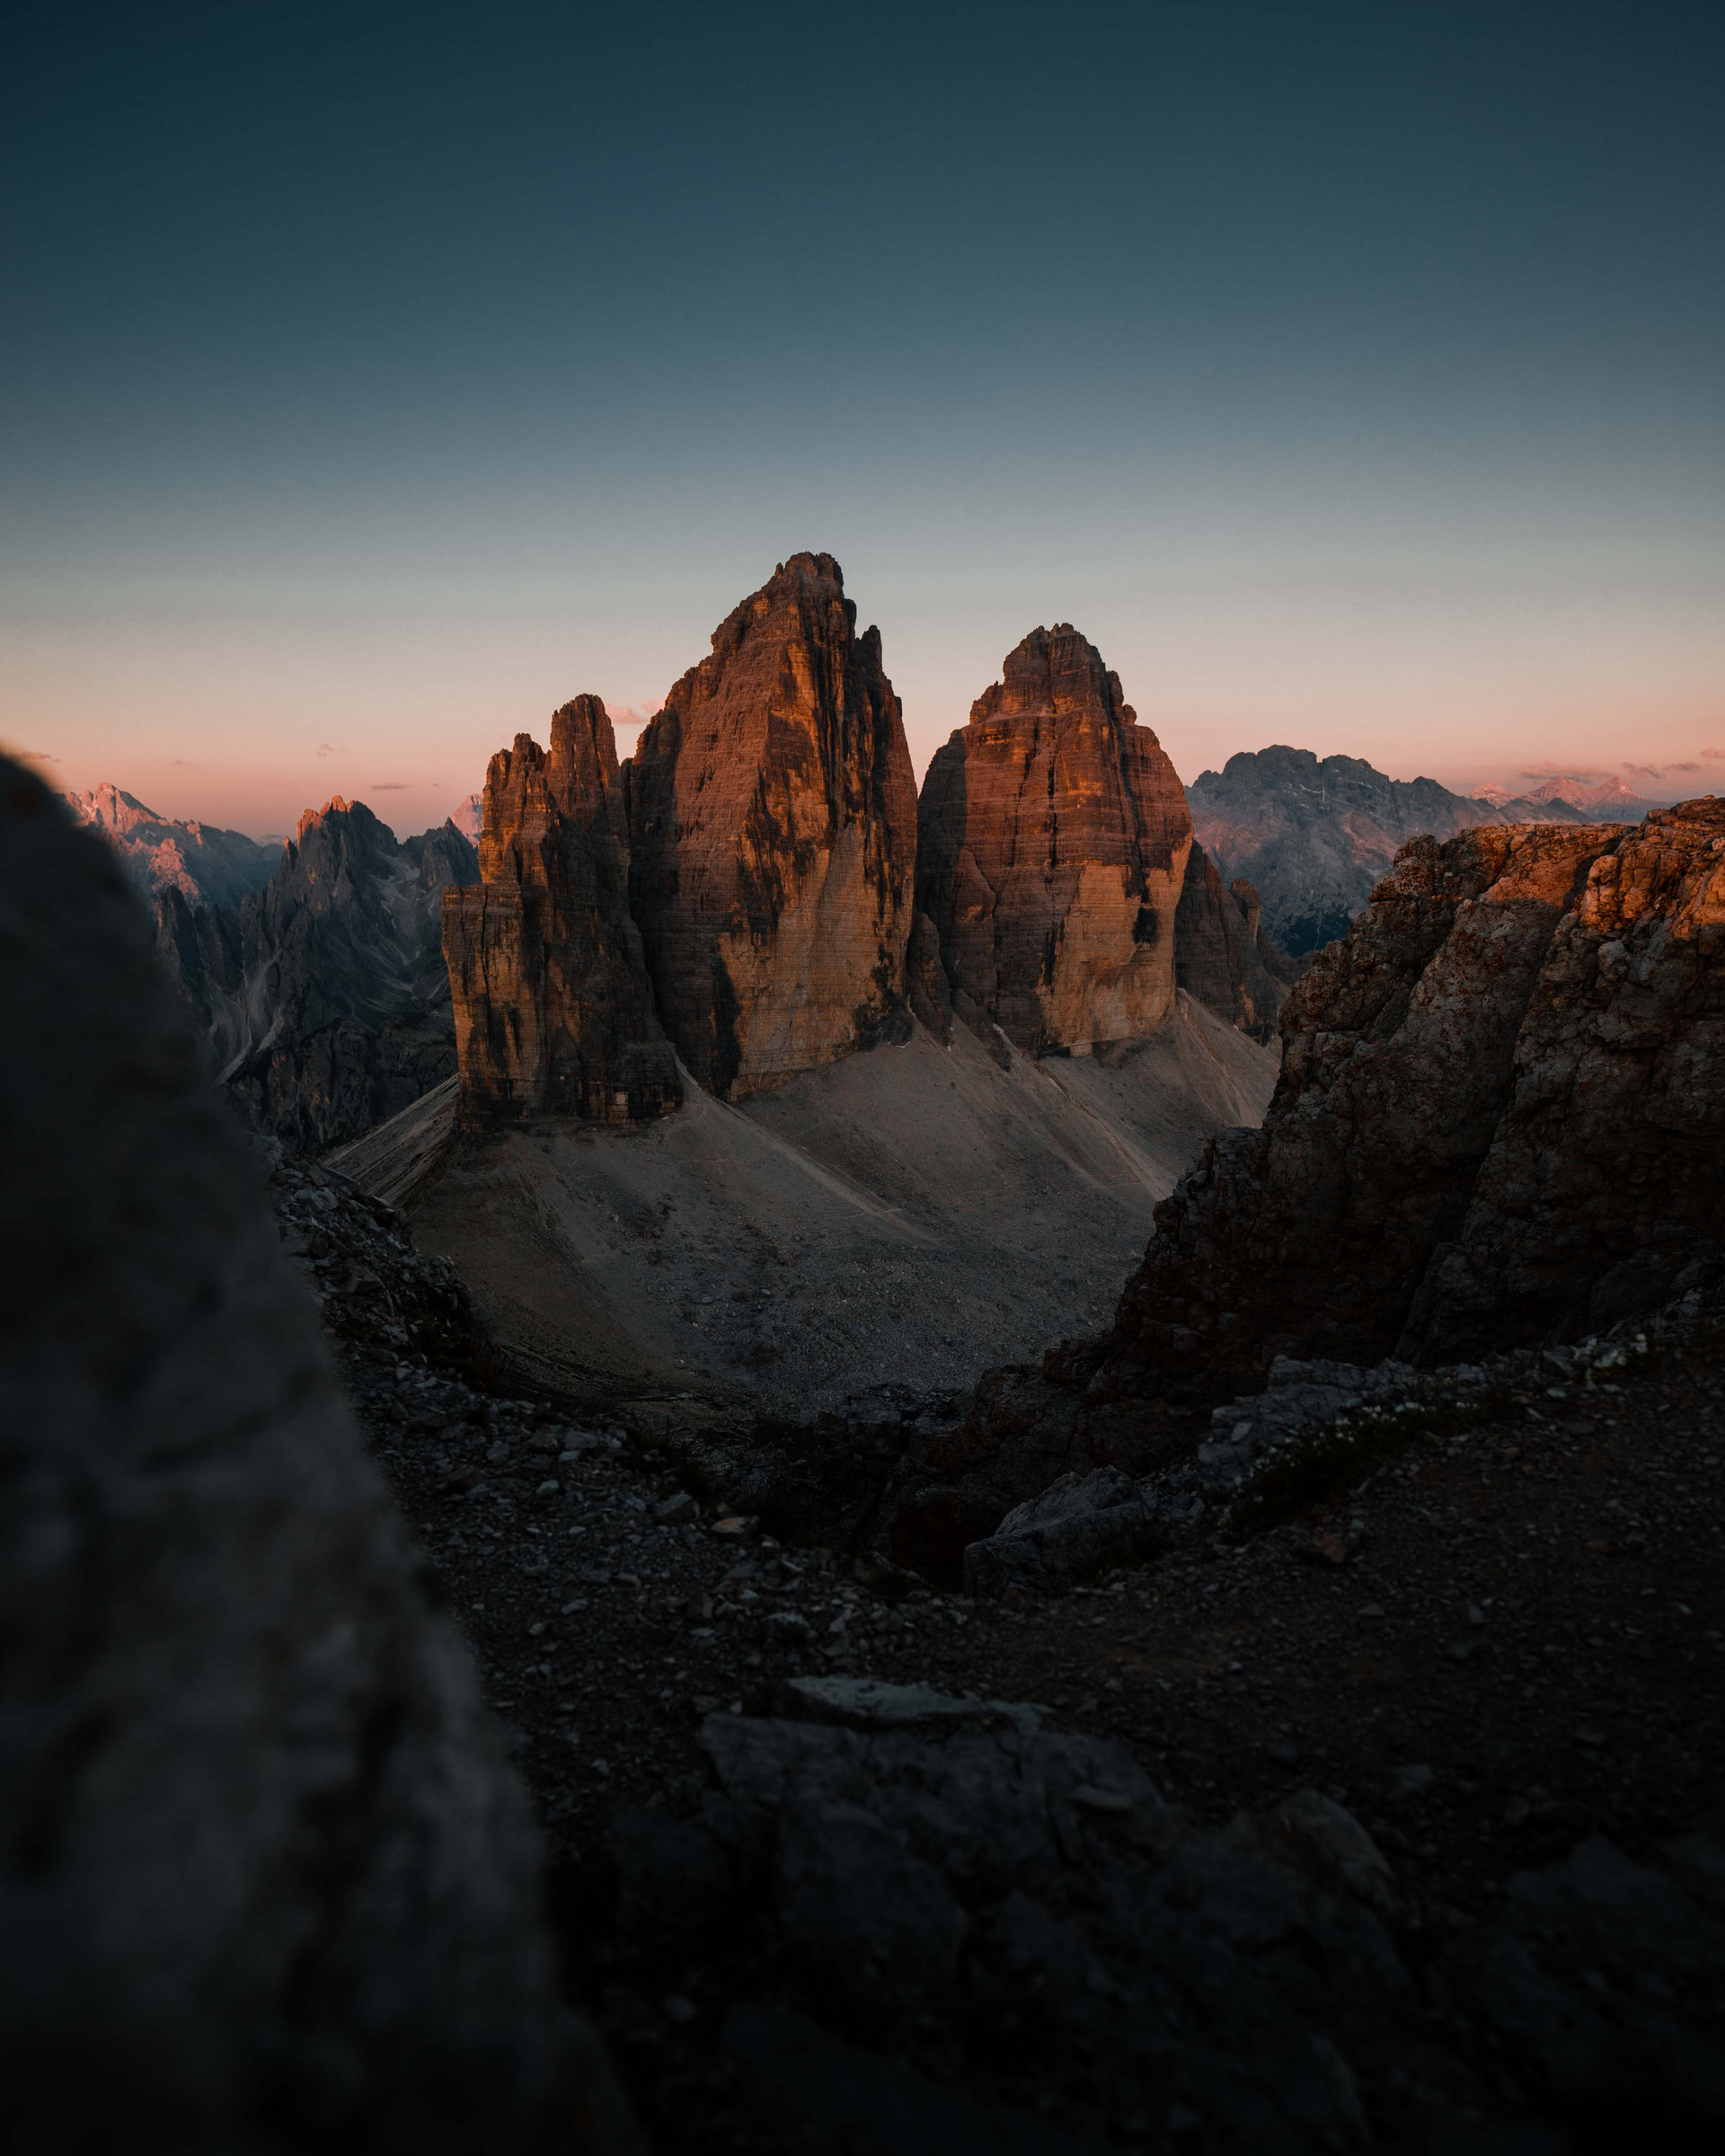 18-07-16-20 Dolomiti-56.jpg